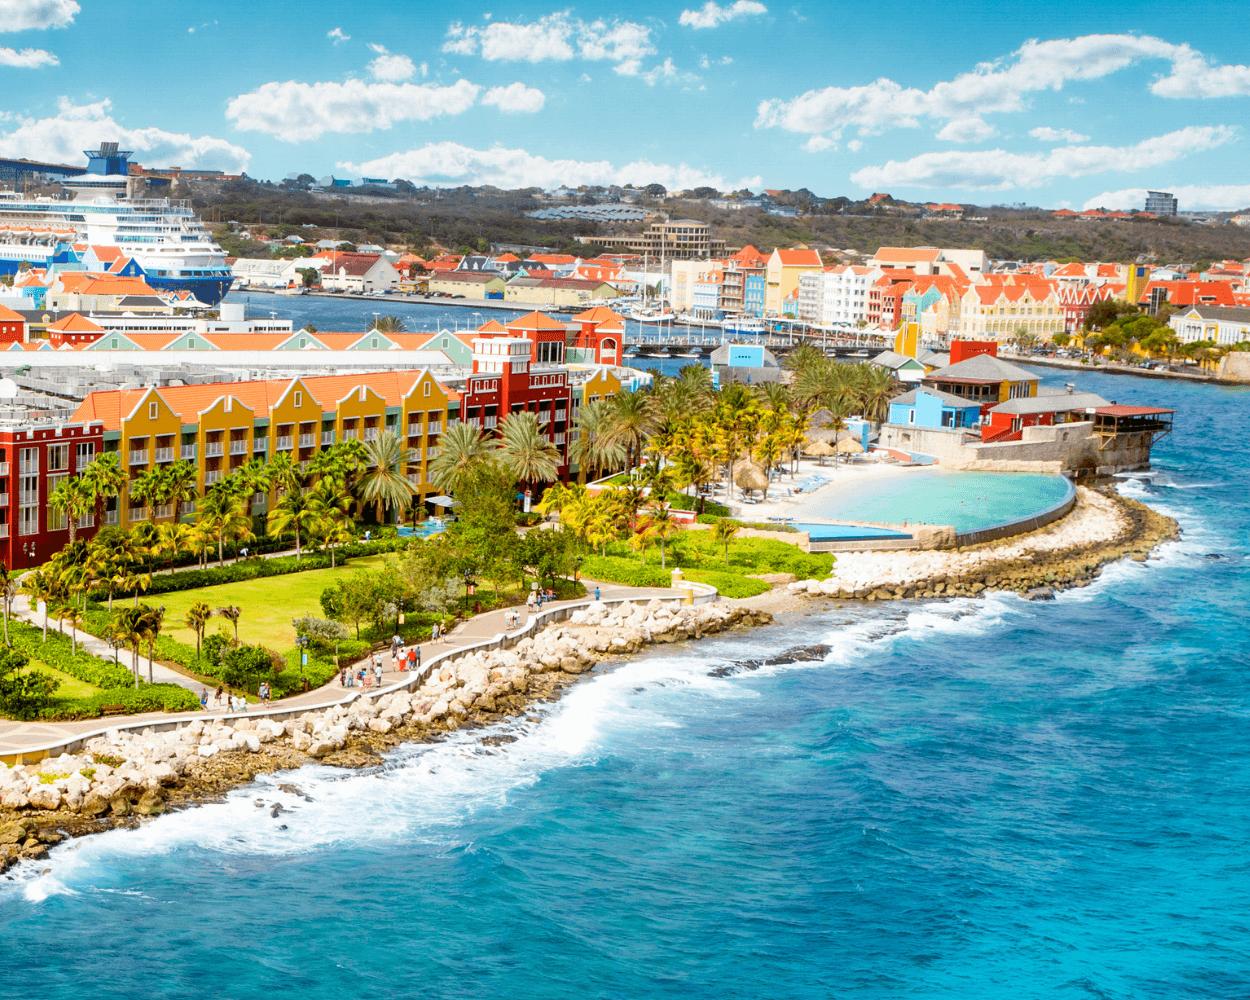 Renaissance Resort Willemstad Curacao